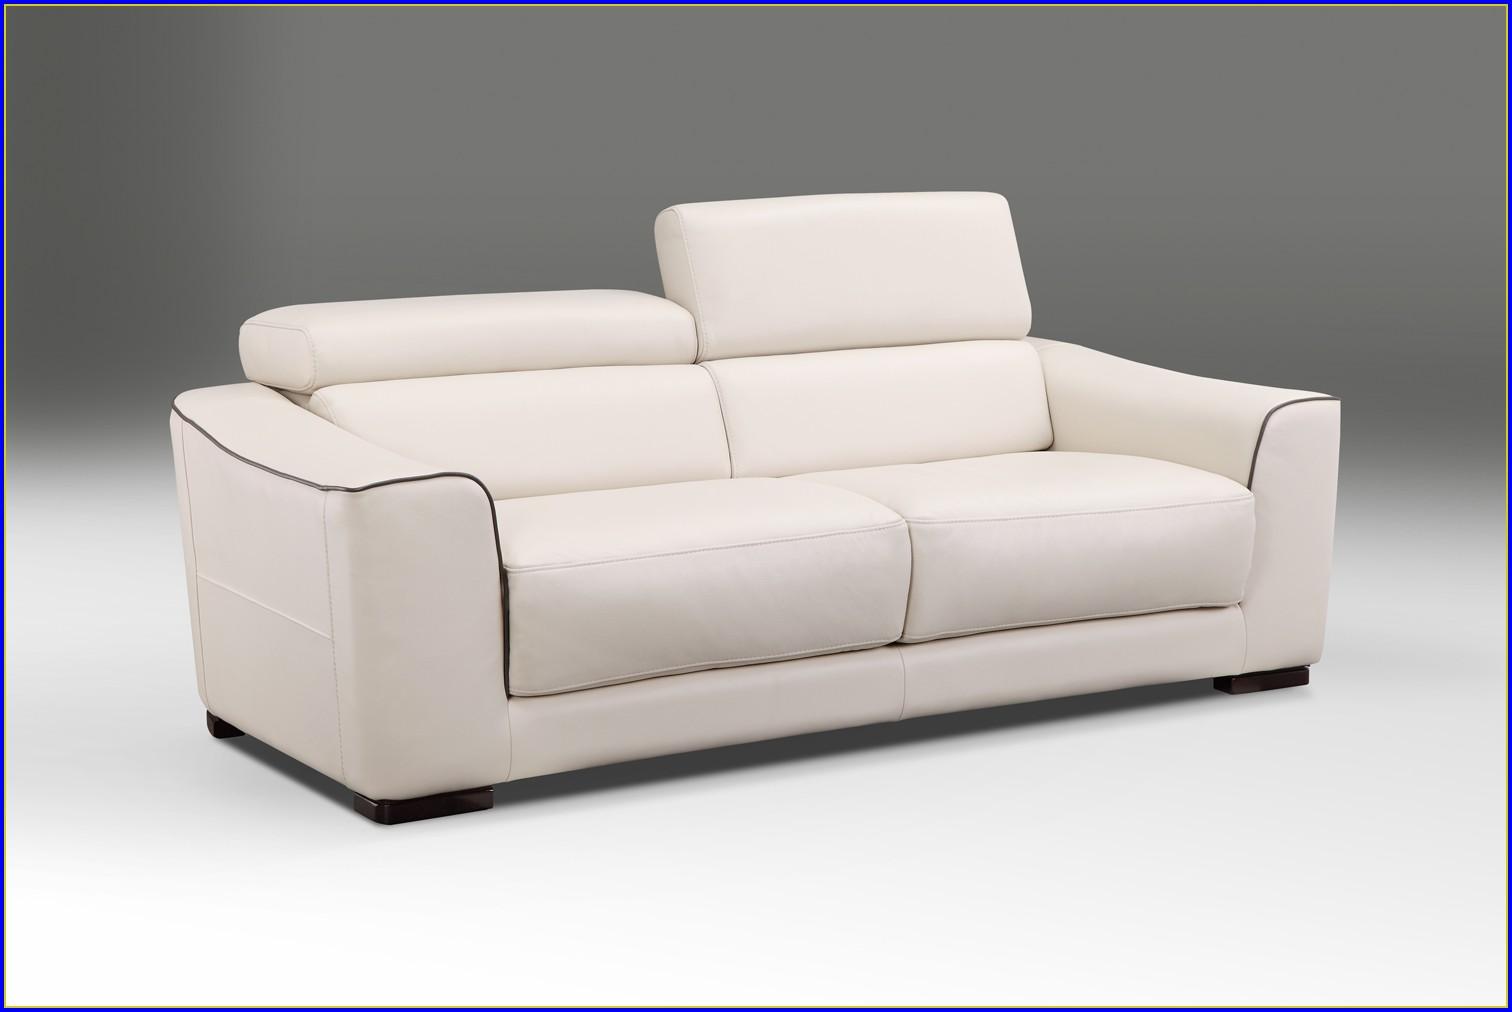 Loveseat Sofa Bed Recliner